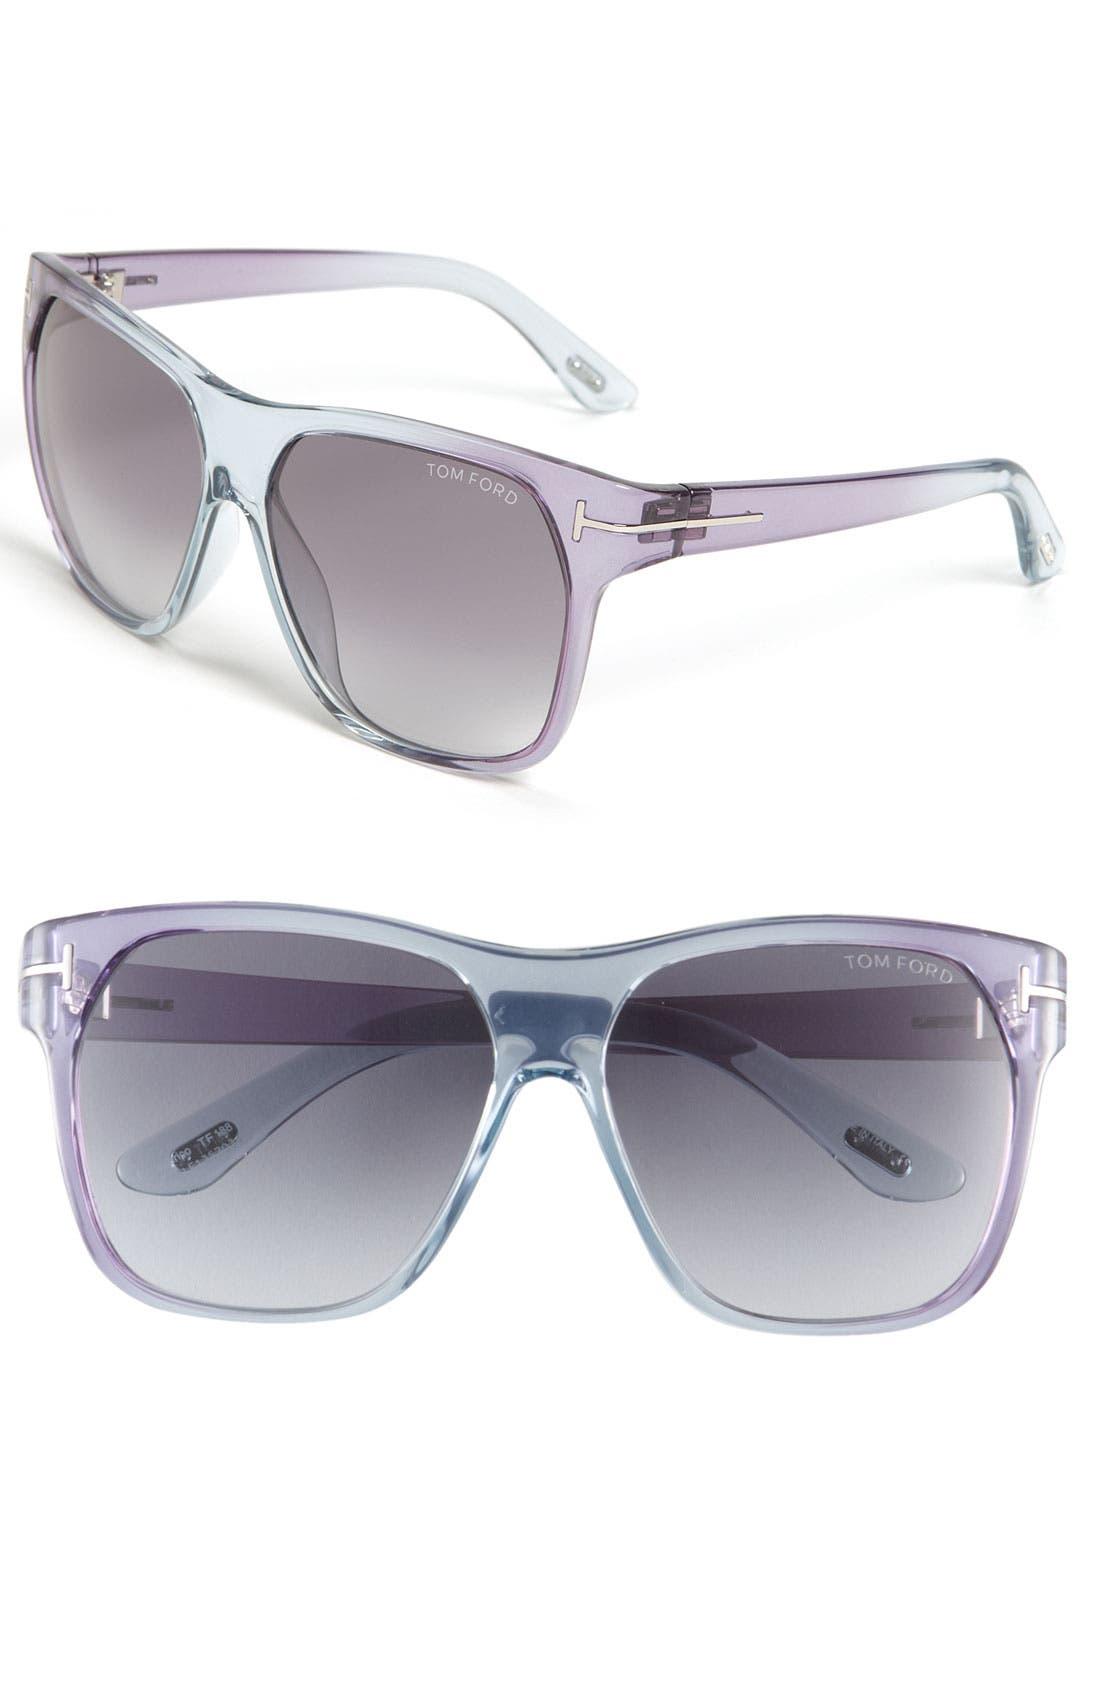 Main Image - Tom Ford Oversized Retro Sunglasses